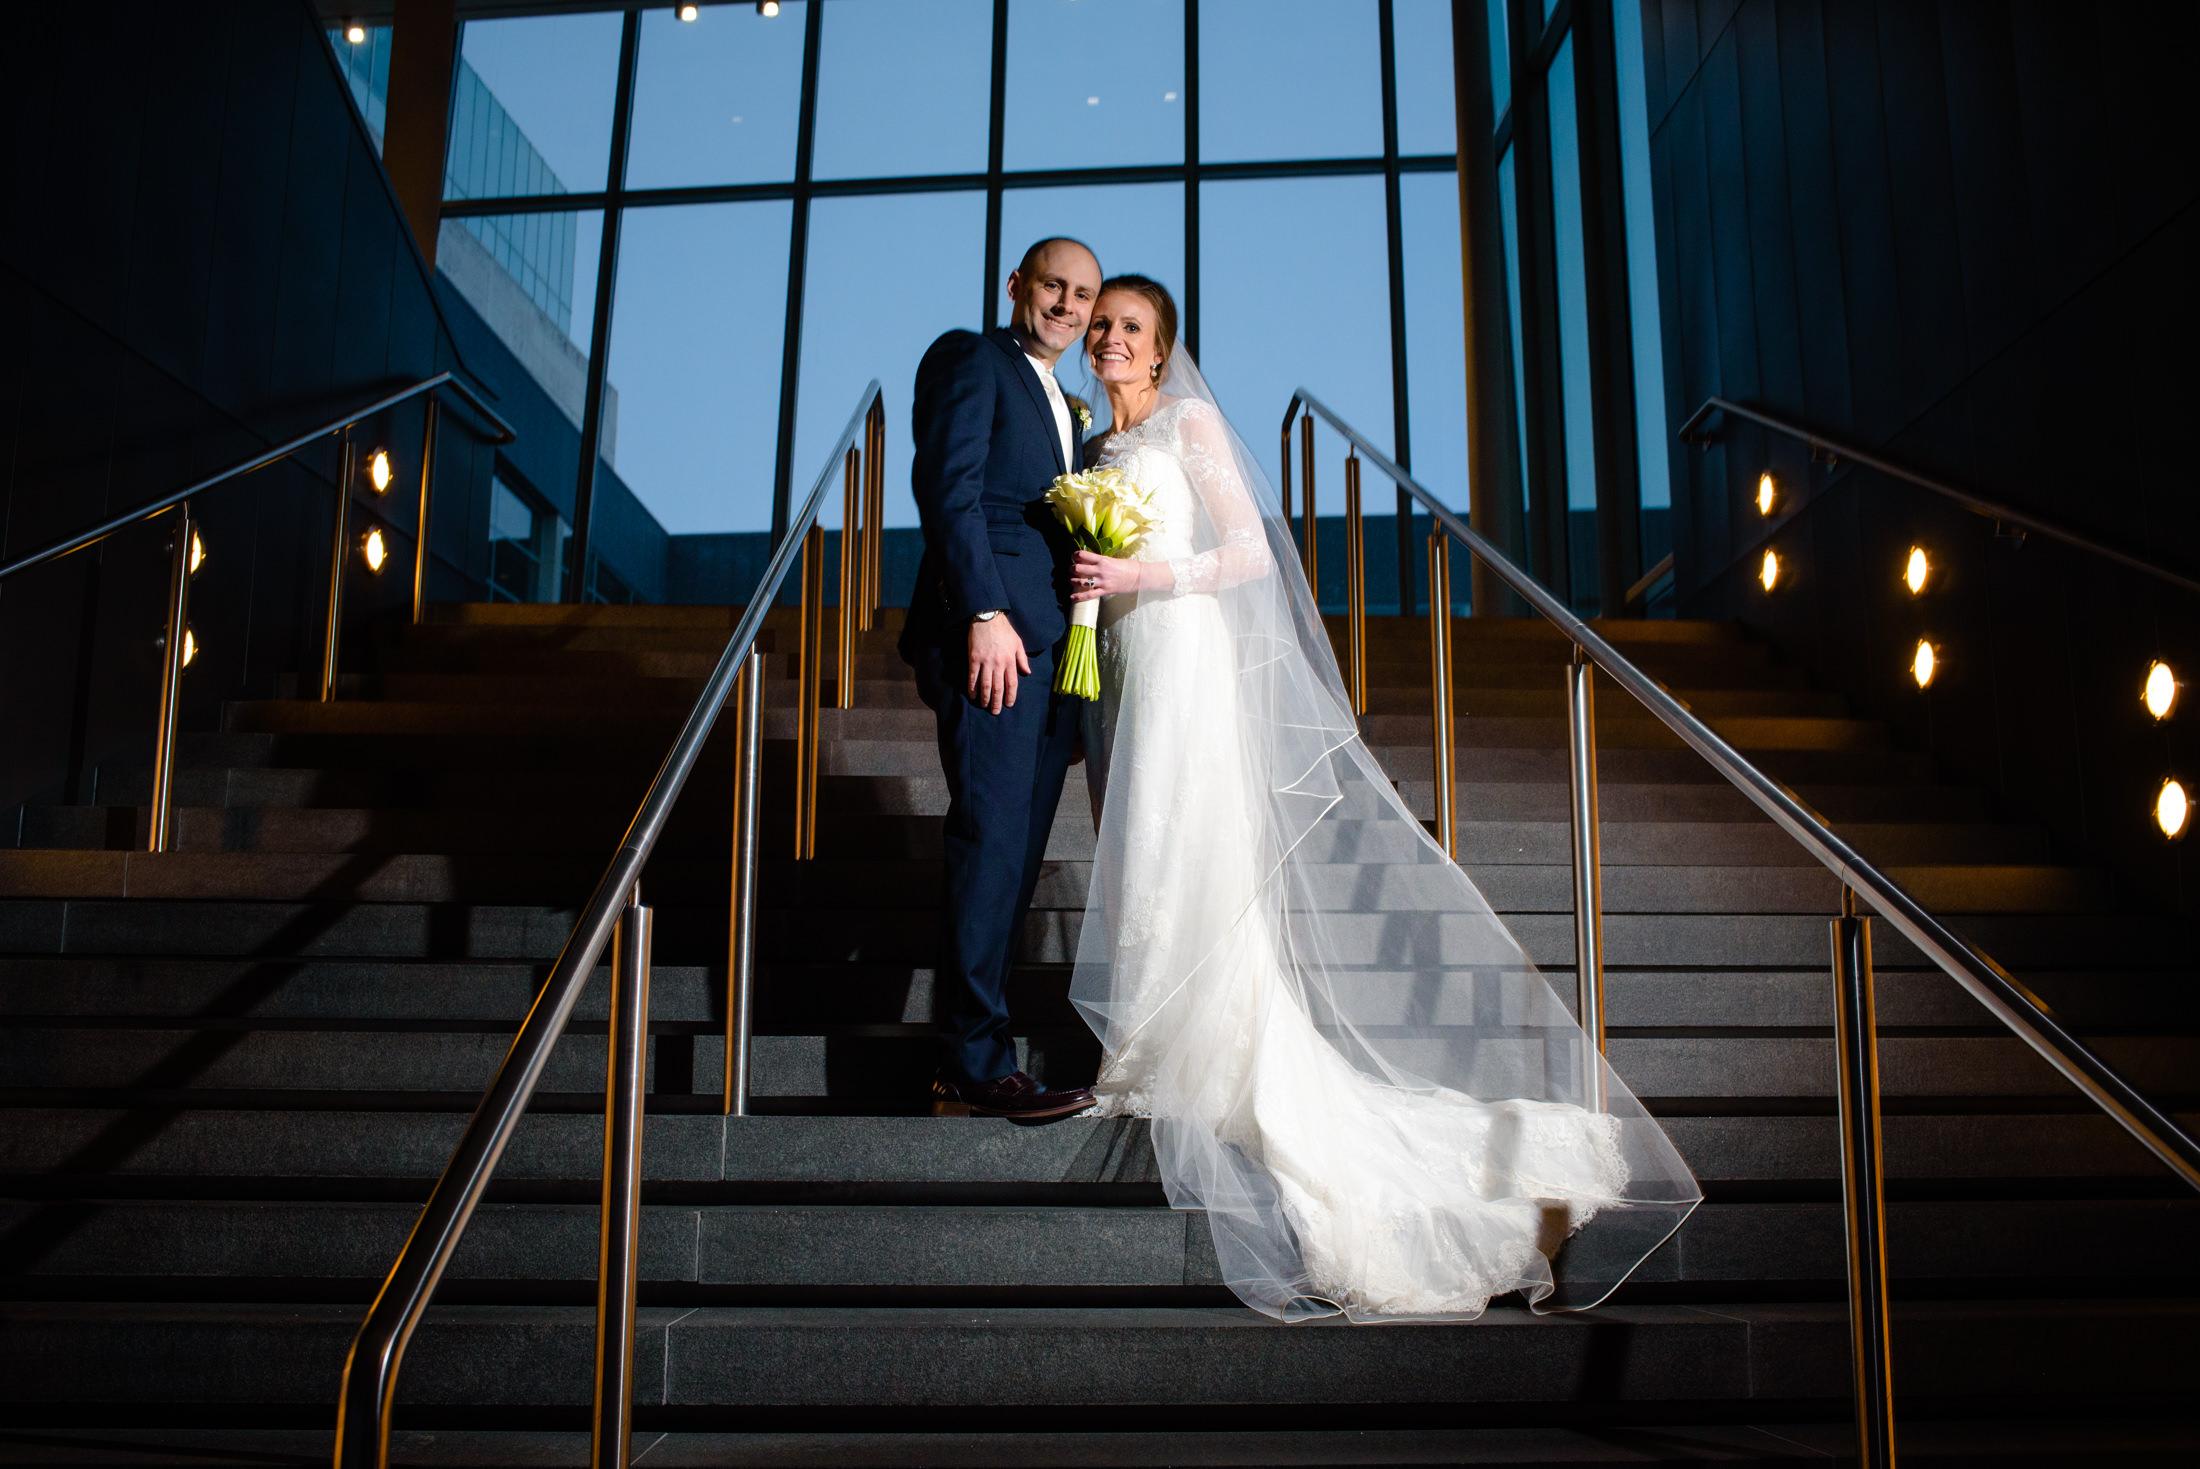 holland-center-reception-omaha-wedding-photographer-0004.JPG